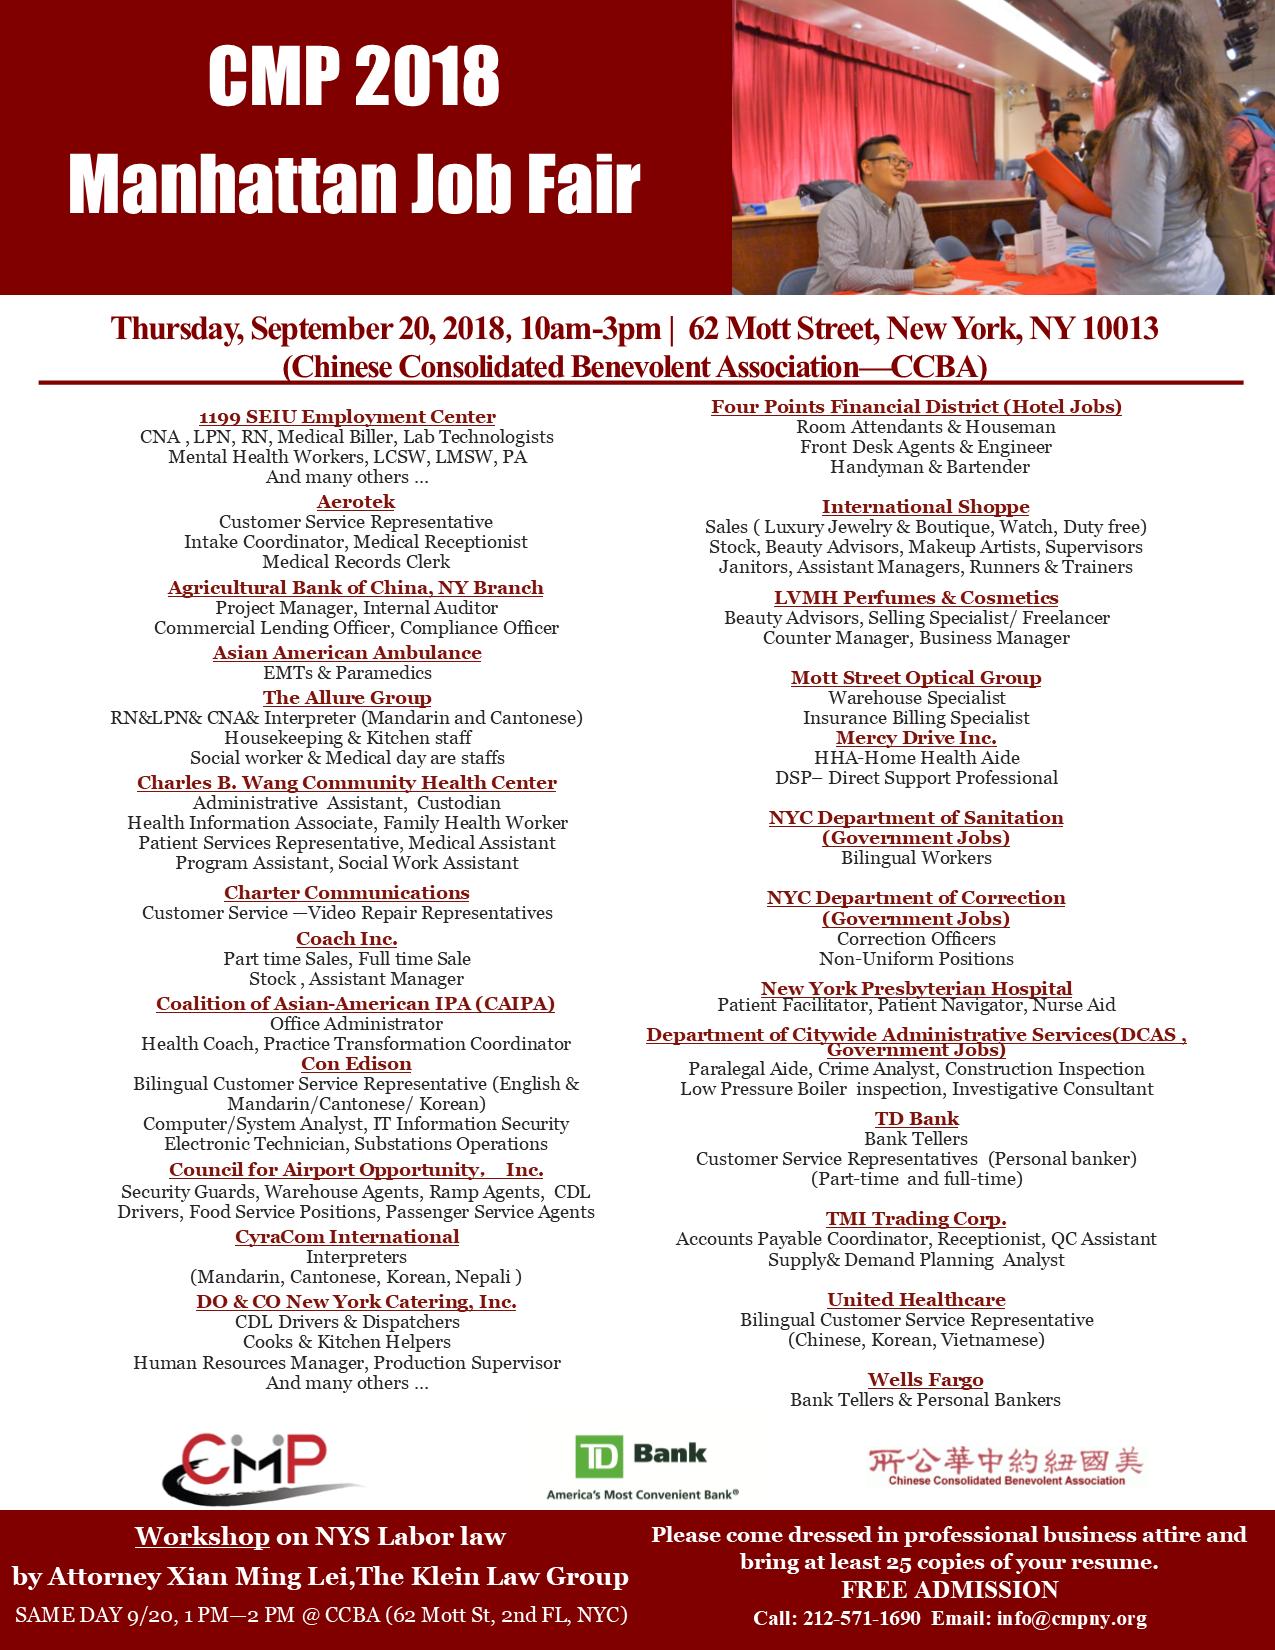 CMP 2018 Manhattan Job Fair - Thur  9/20 @ 62 Mott St  NYC — CMP